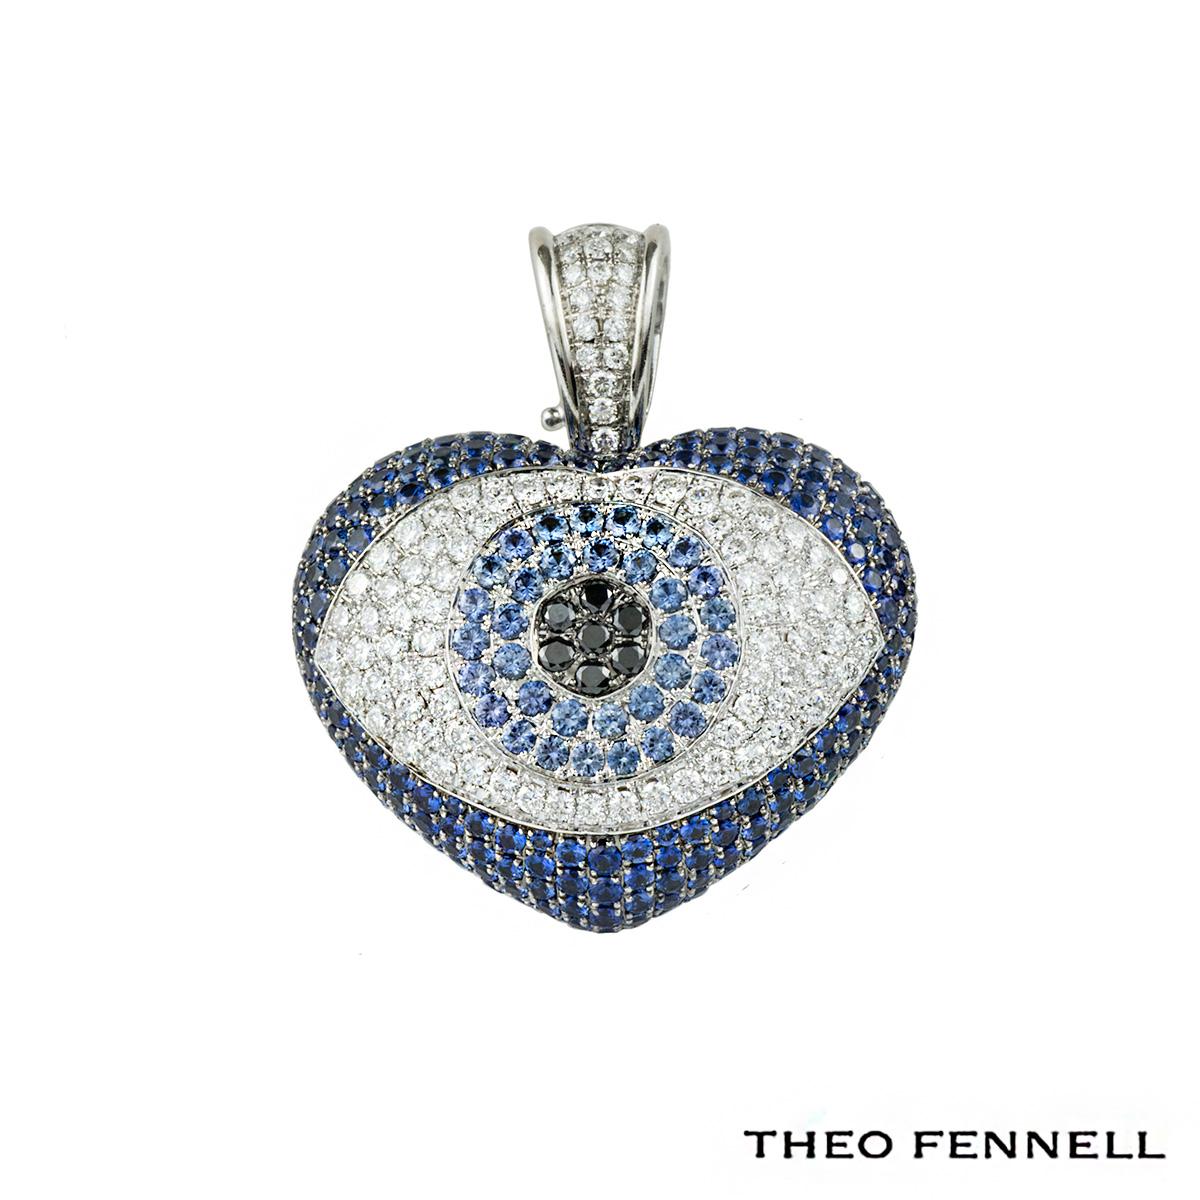 Theo Fennell 18k White Gold Sapphire and Diamond Evil Eye Art Pendant